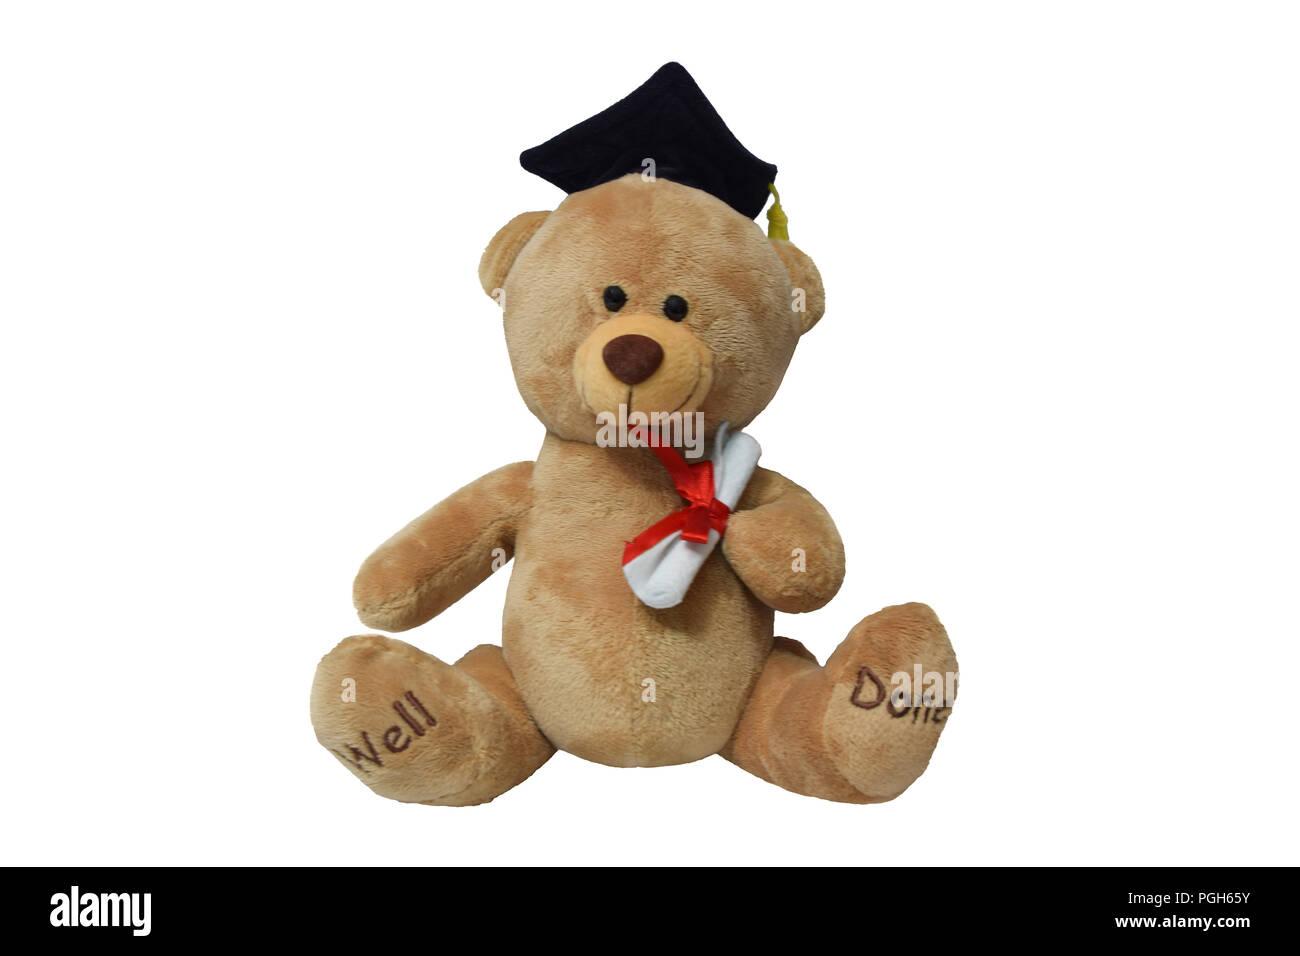 Graduated teddy bear isolated on white - Stock Image